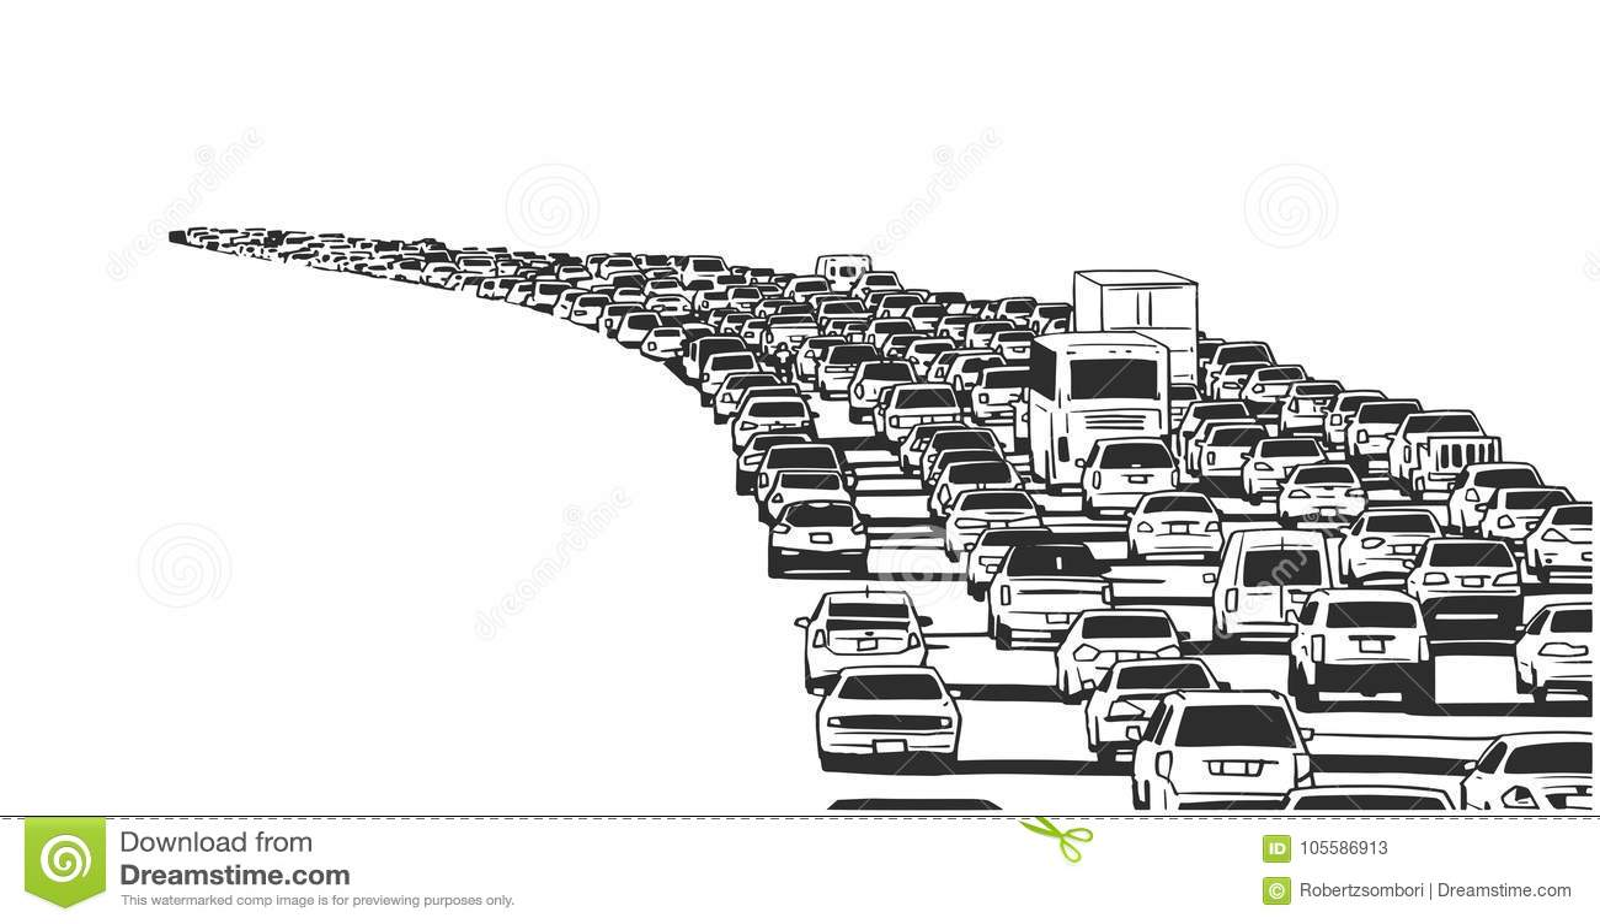 Illustration Of Rush Hour Traffic Jam On Freeway Stock Vector ...